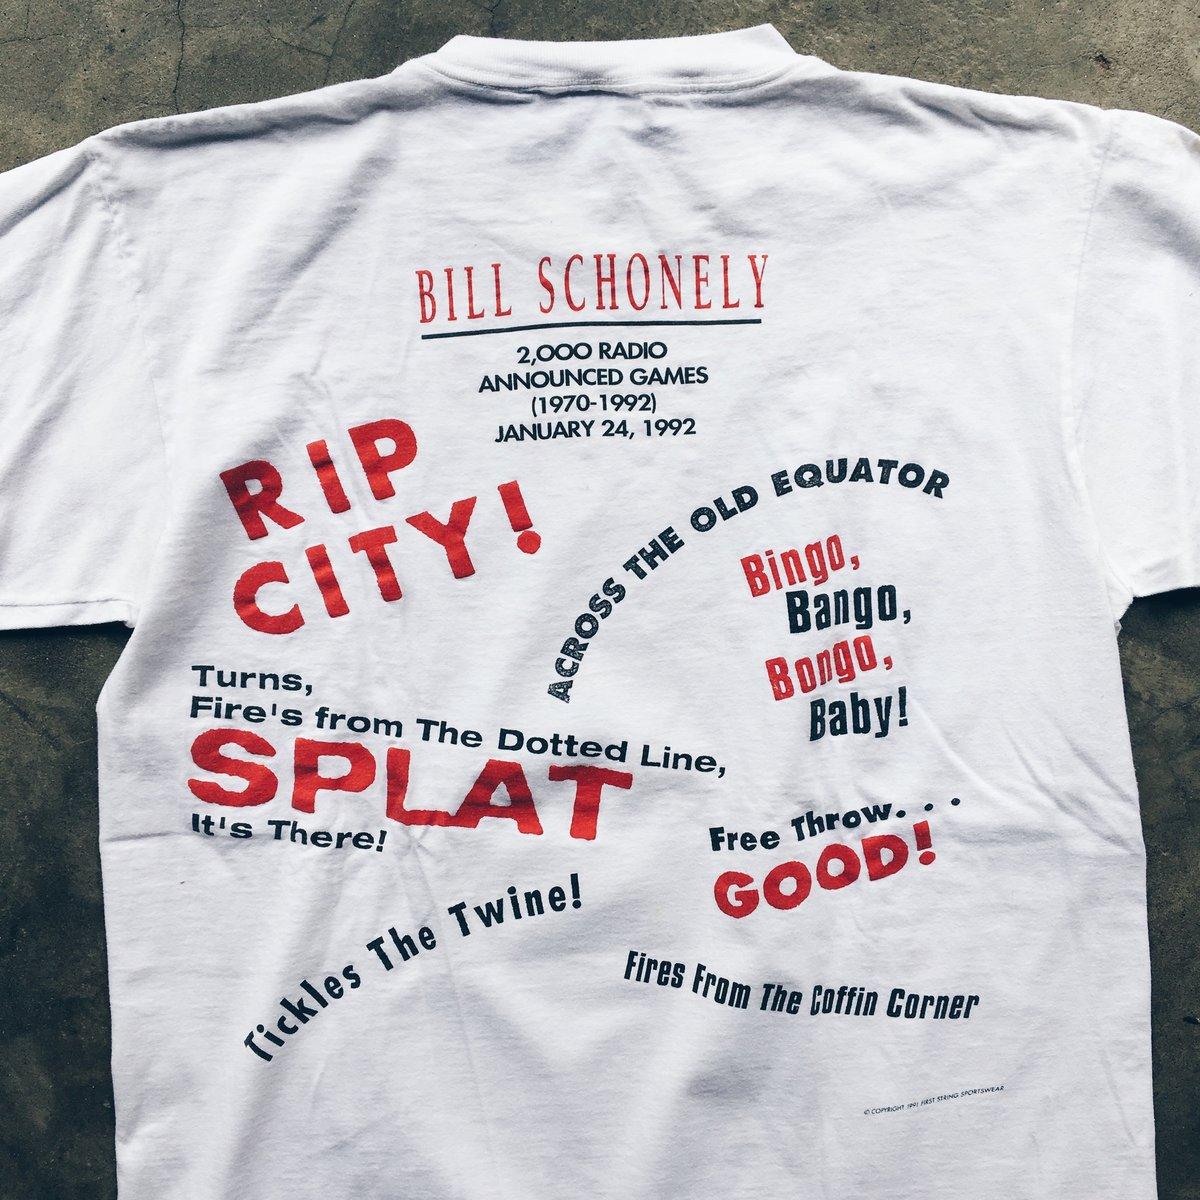 Image of Original 1991 Bill Schonely Rip City Tee.